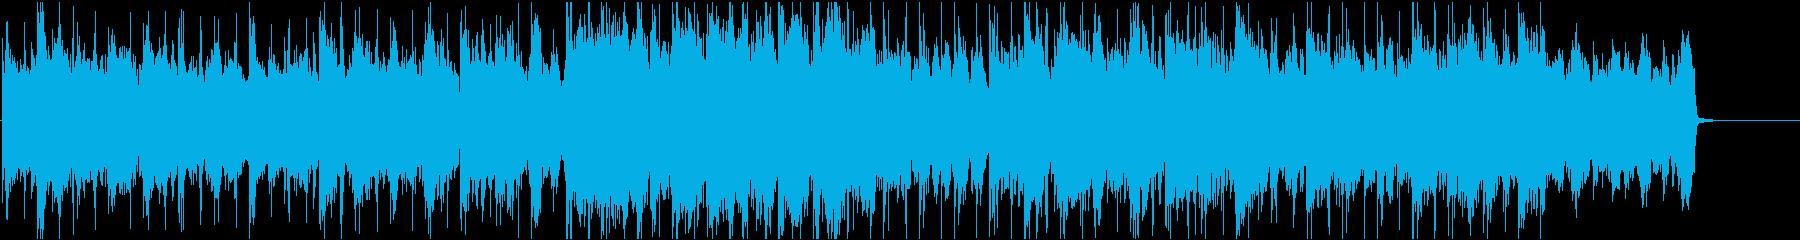 CMや映像に ピアノによる洗練された美の再生済みの波形